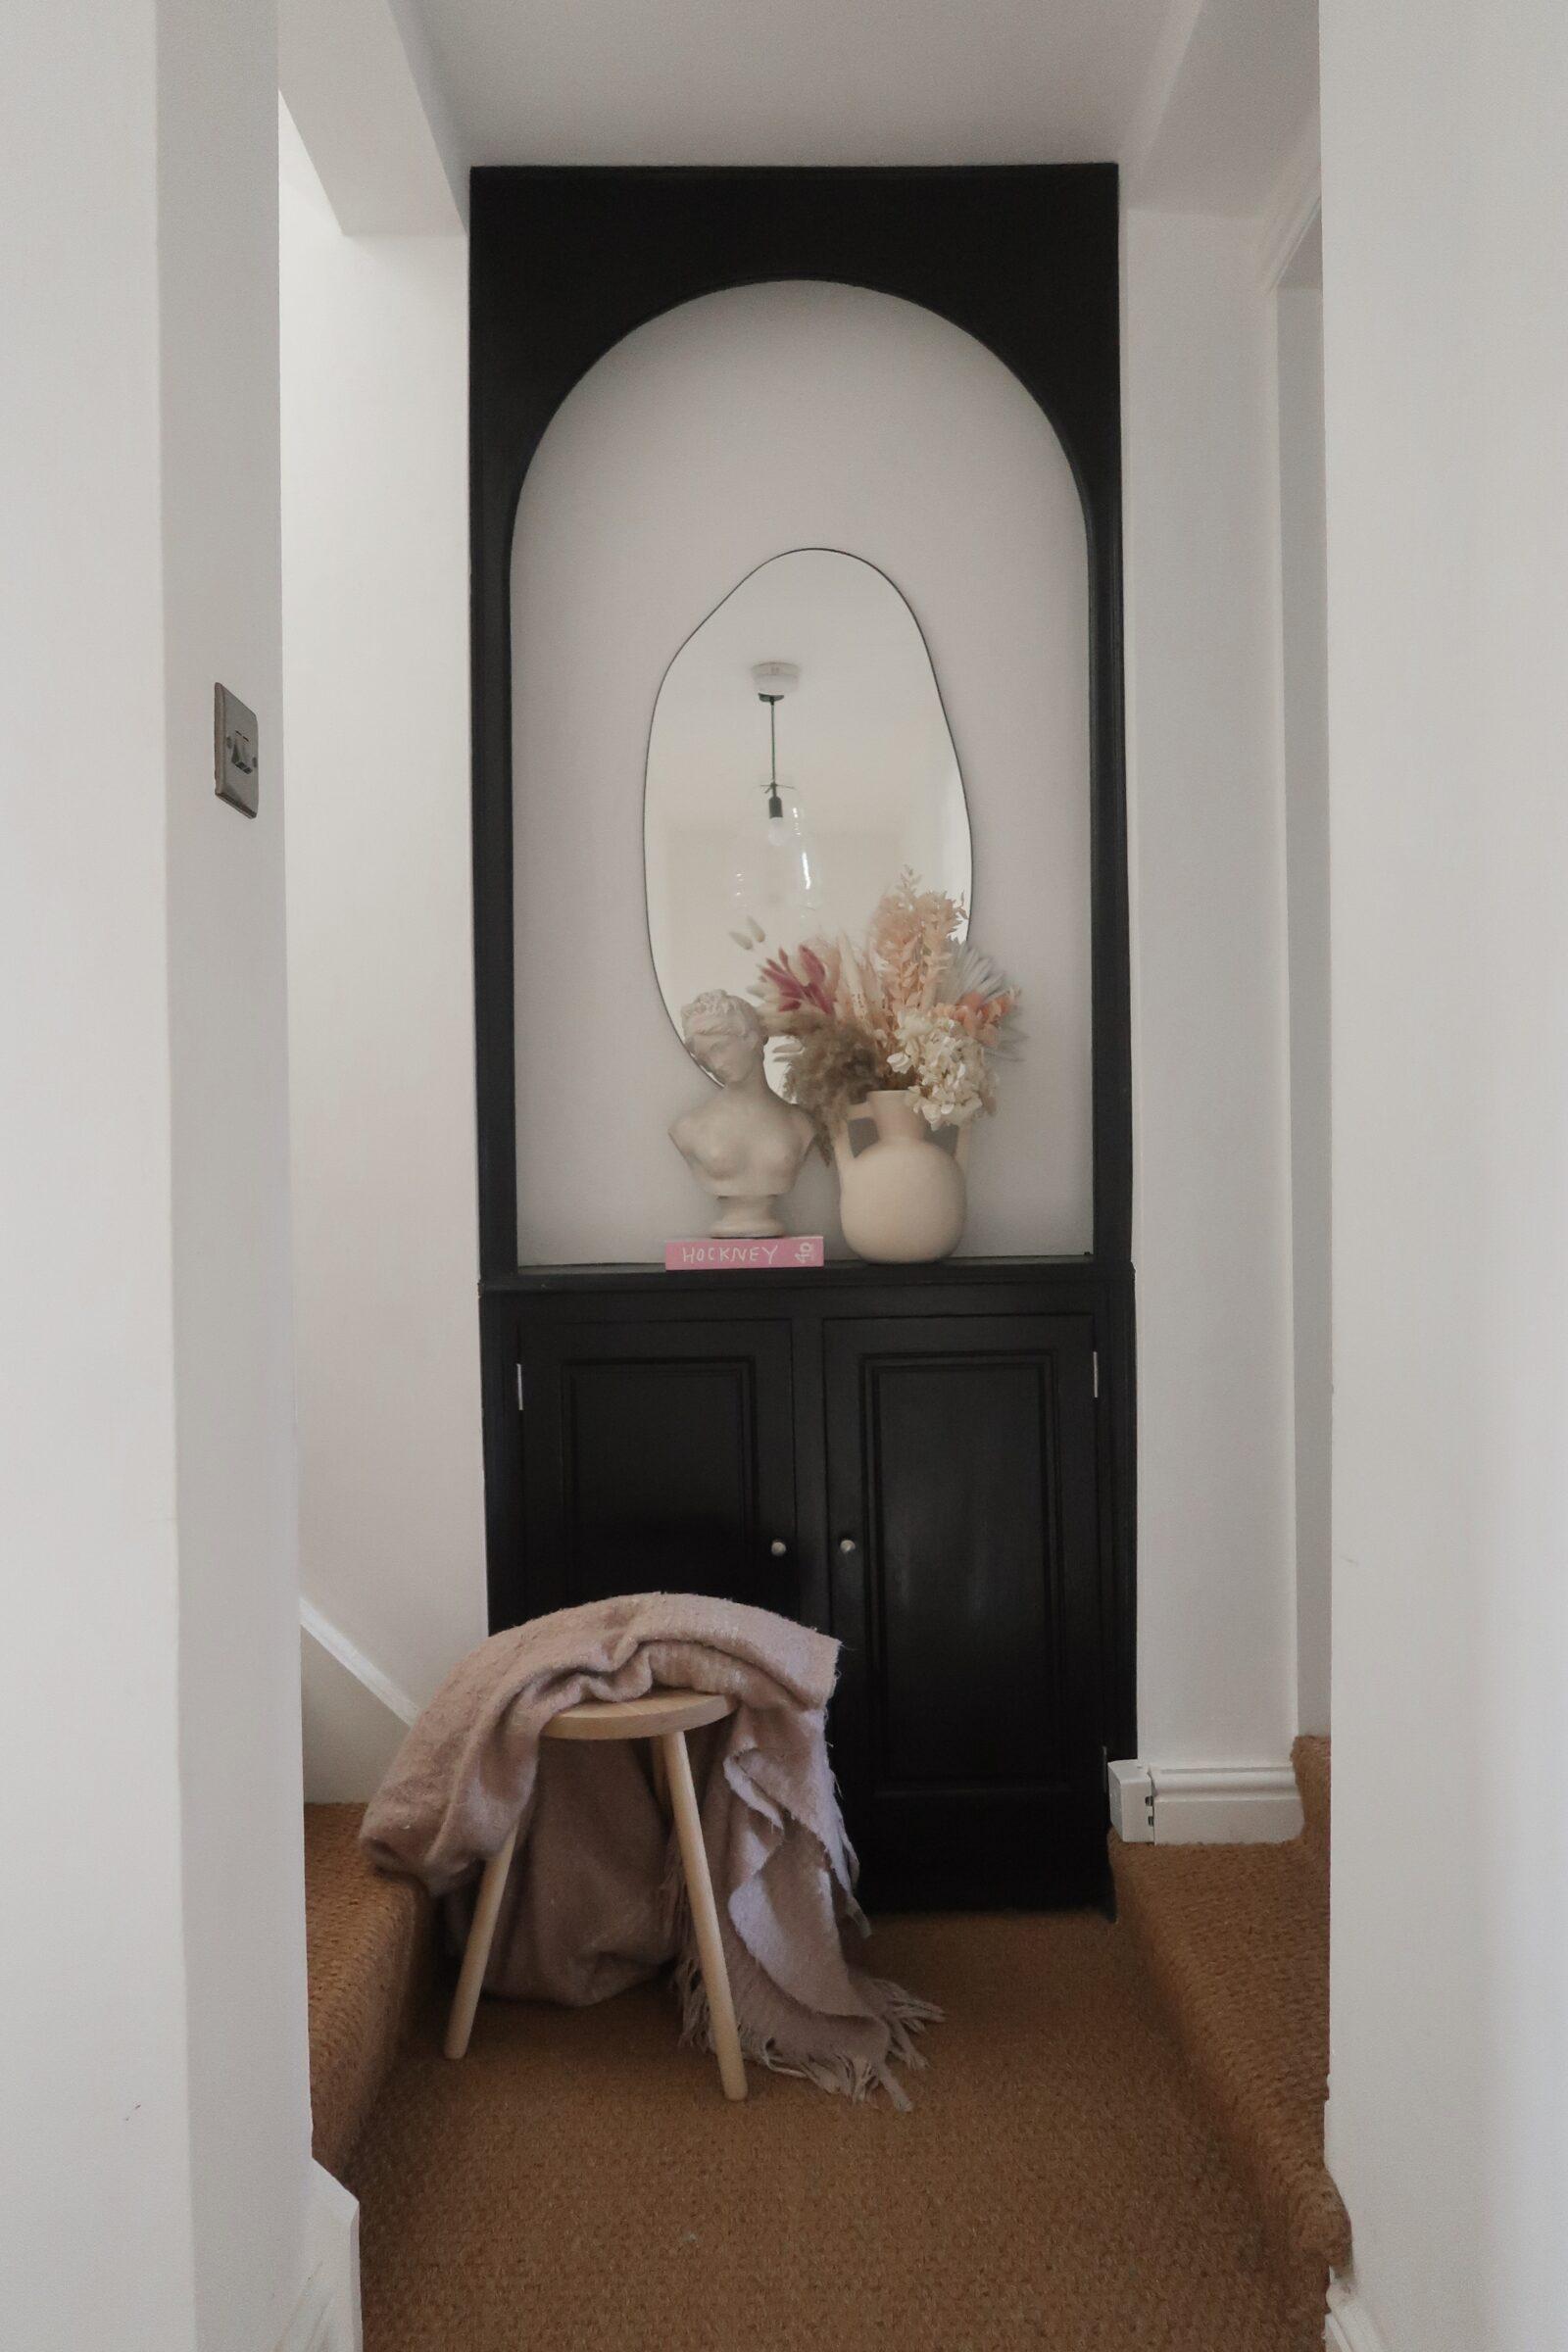 Hallway Decorating Ideas - Monochrome Decor